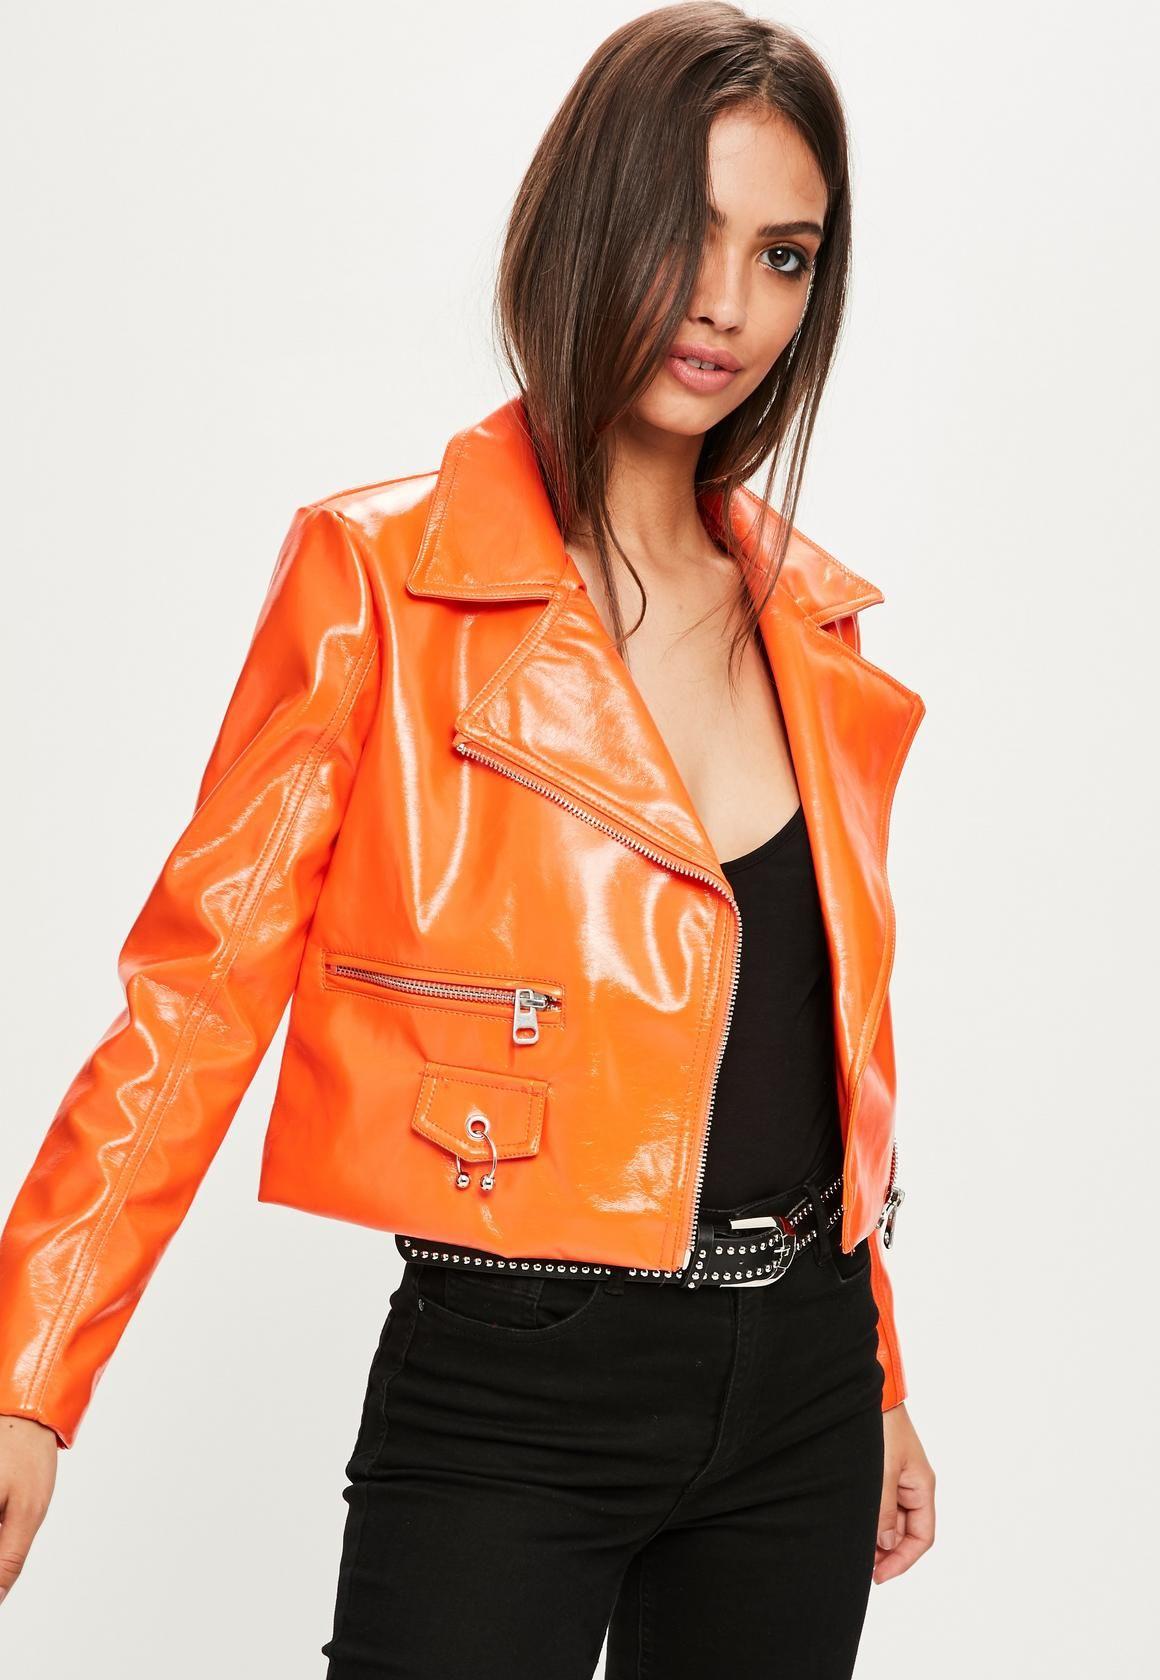 dcc8cbae866db Missguided - Orange Vinyl Biker Jacket